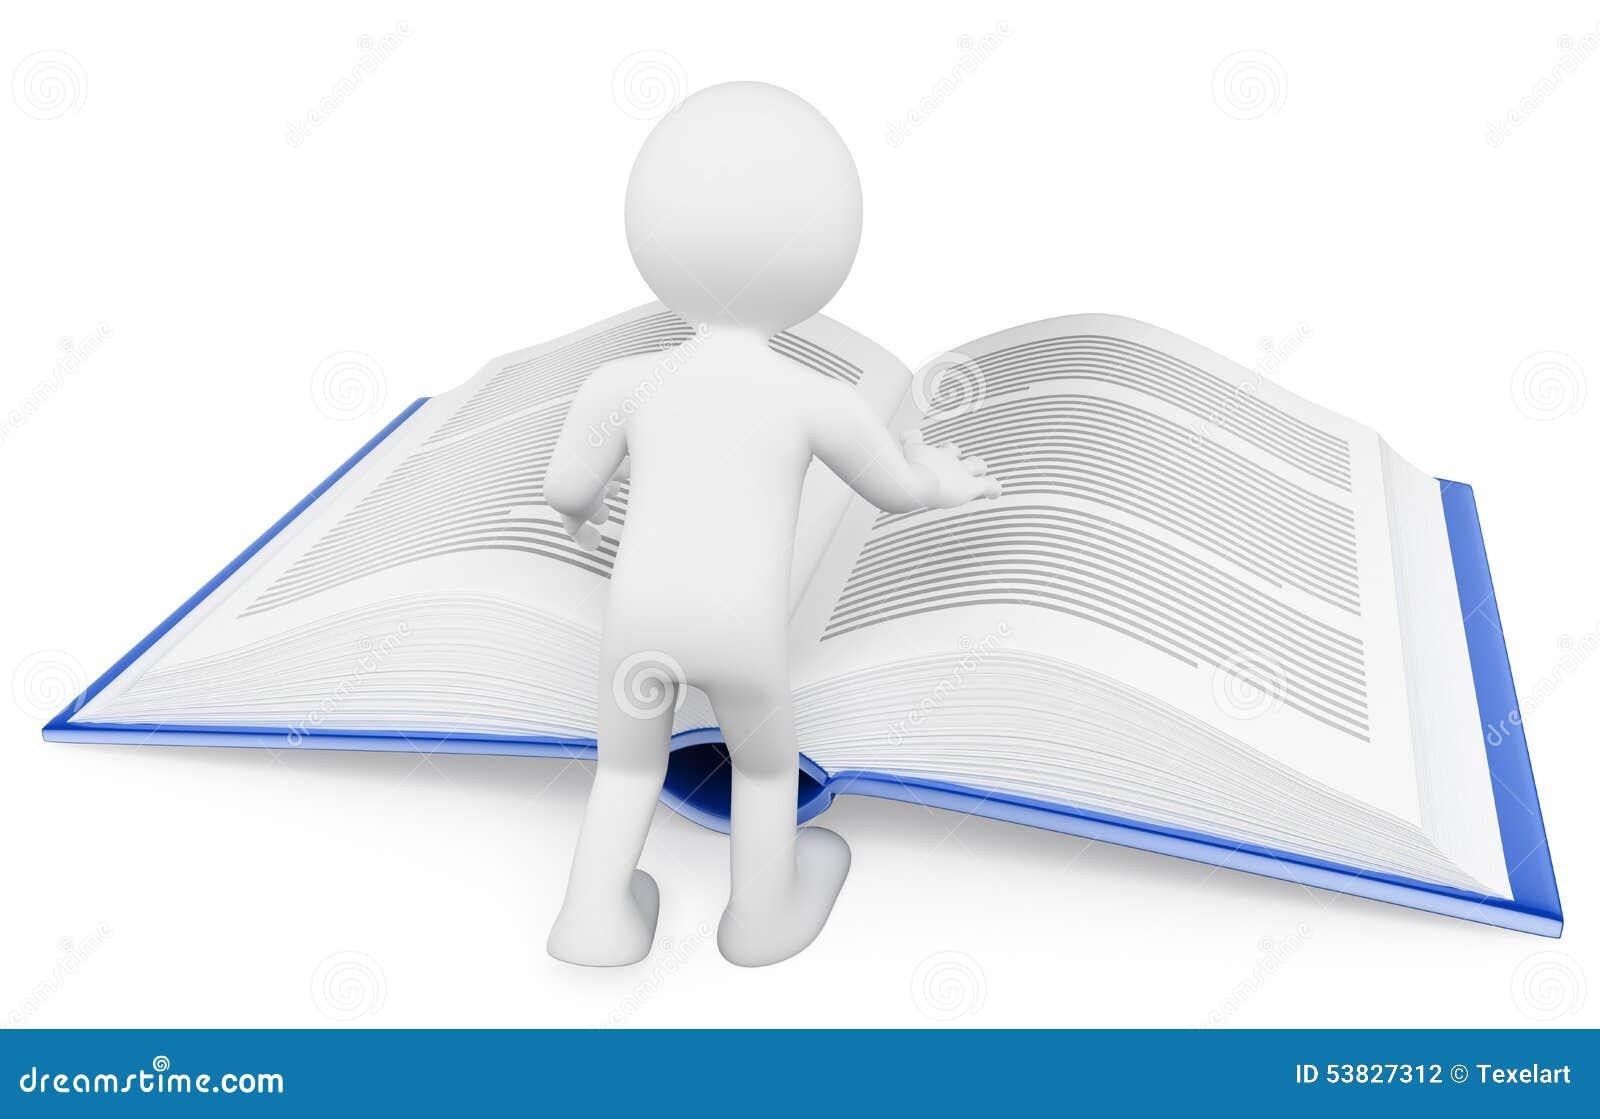 ebook Educational Design Research: The Design,